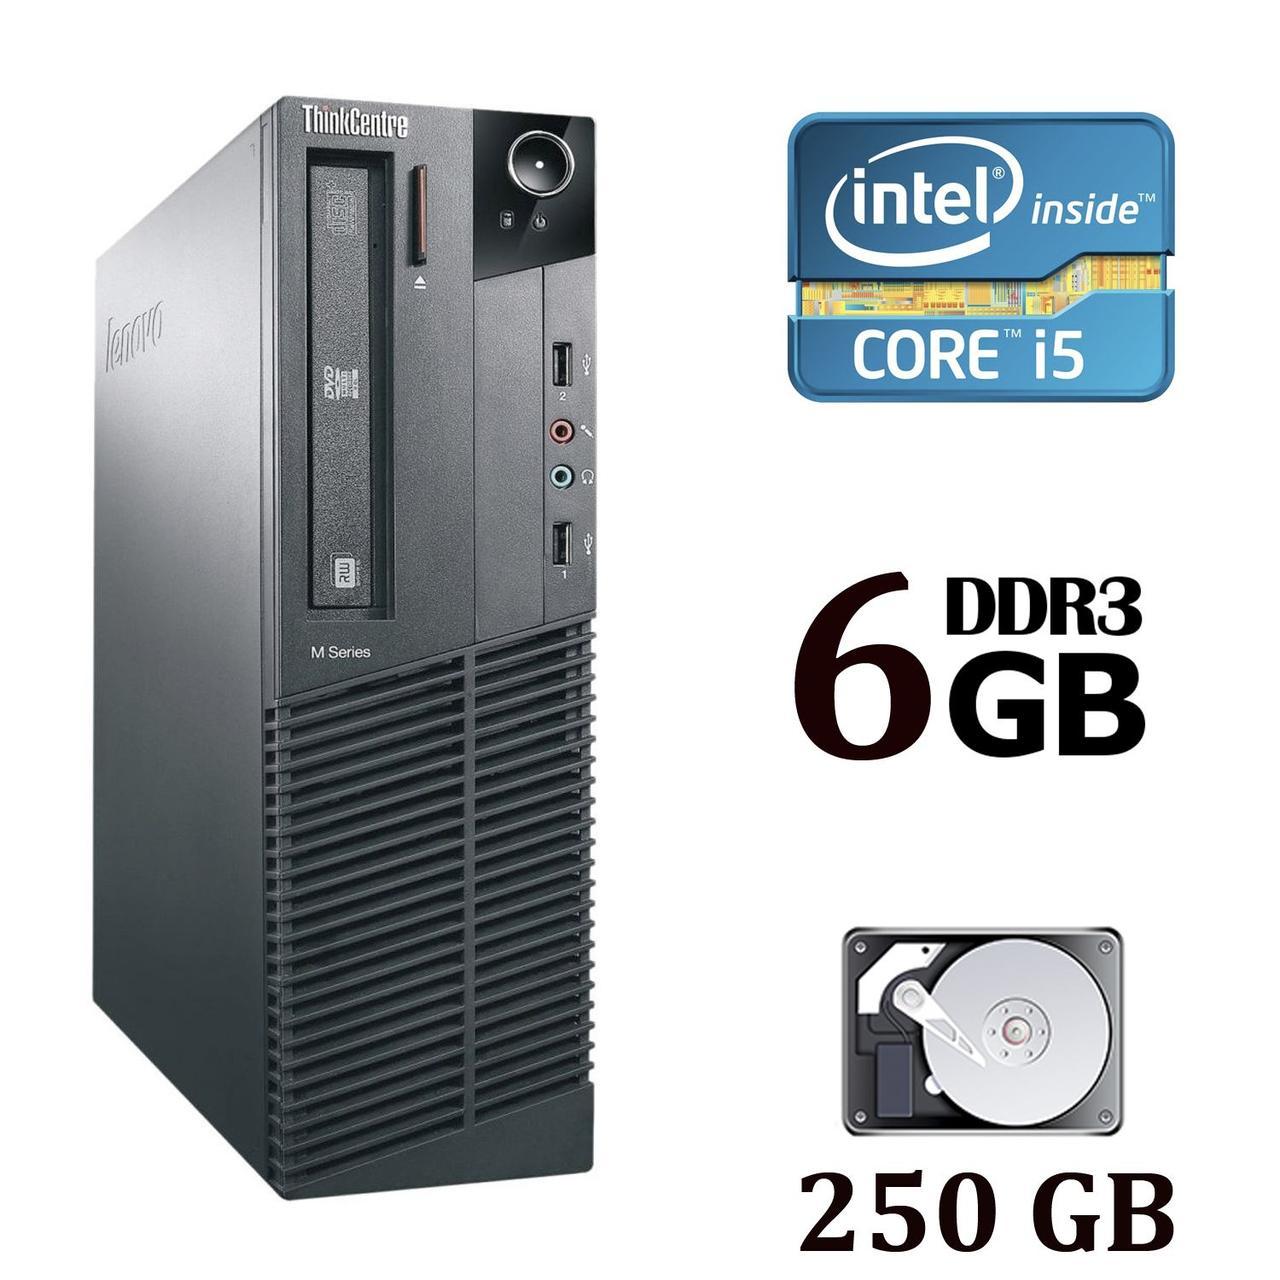 Lenovo Thinkcentre M91 p70 Desktop / Intel® Core™ i5-2400 (4 ядра по 3.10 - 3.40 GHz) / 6 GB DDR3 / 250 GB HDD